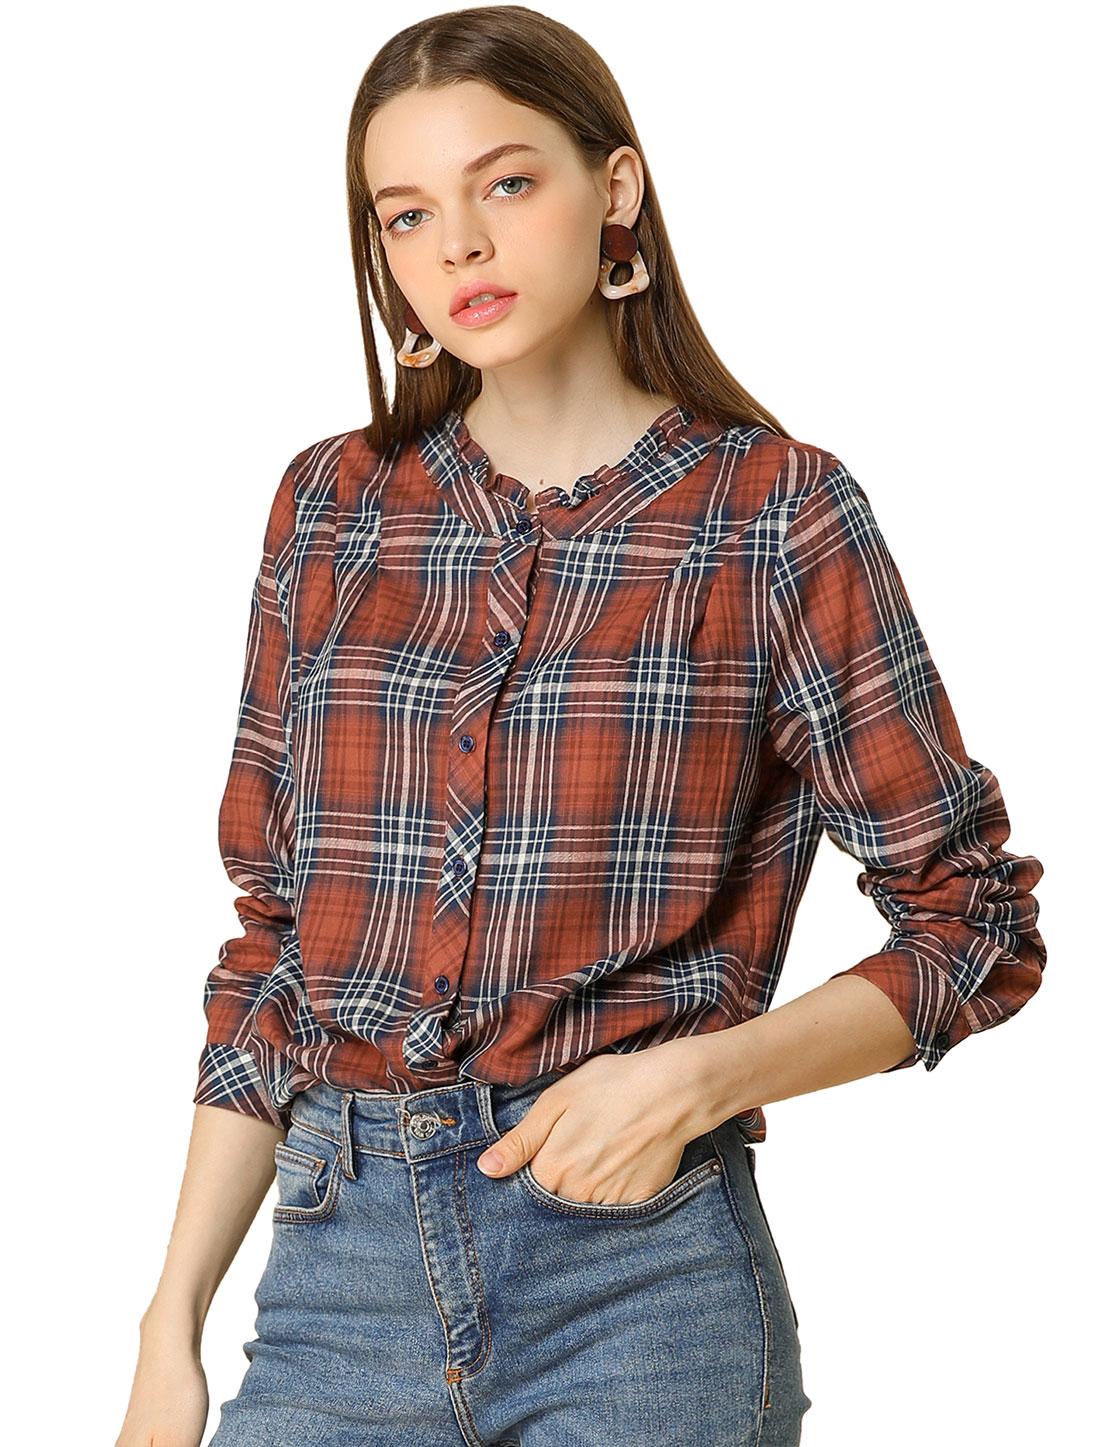 Allegra K Women's Fall Blouse Long Sleeve Ruffle Neck Plaid Shirt Red M